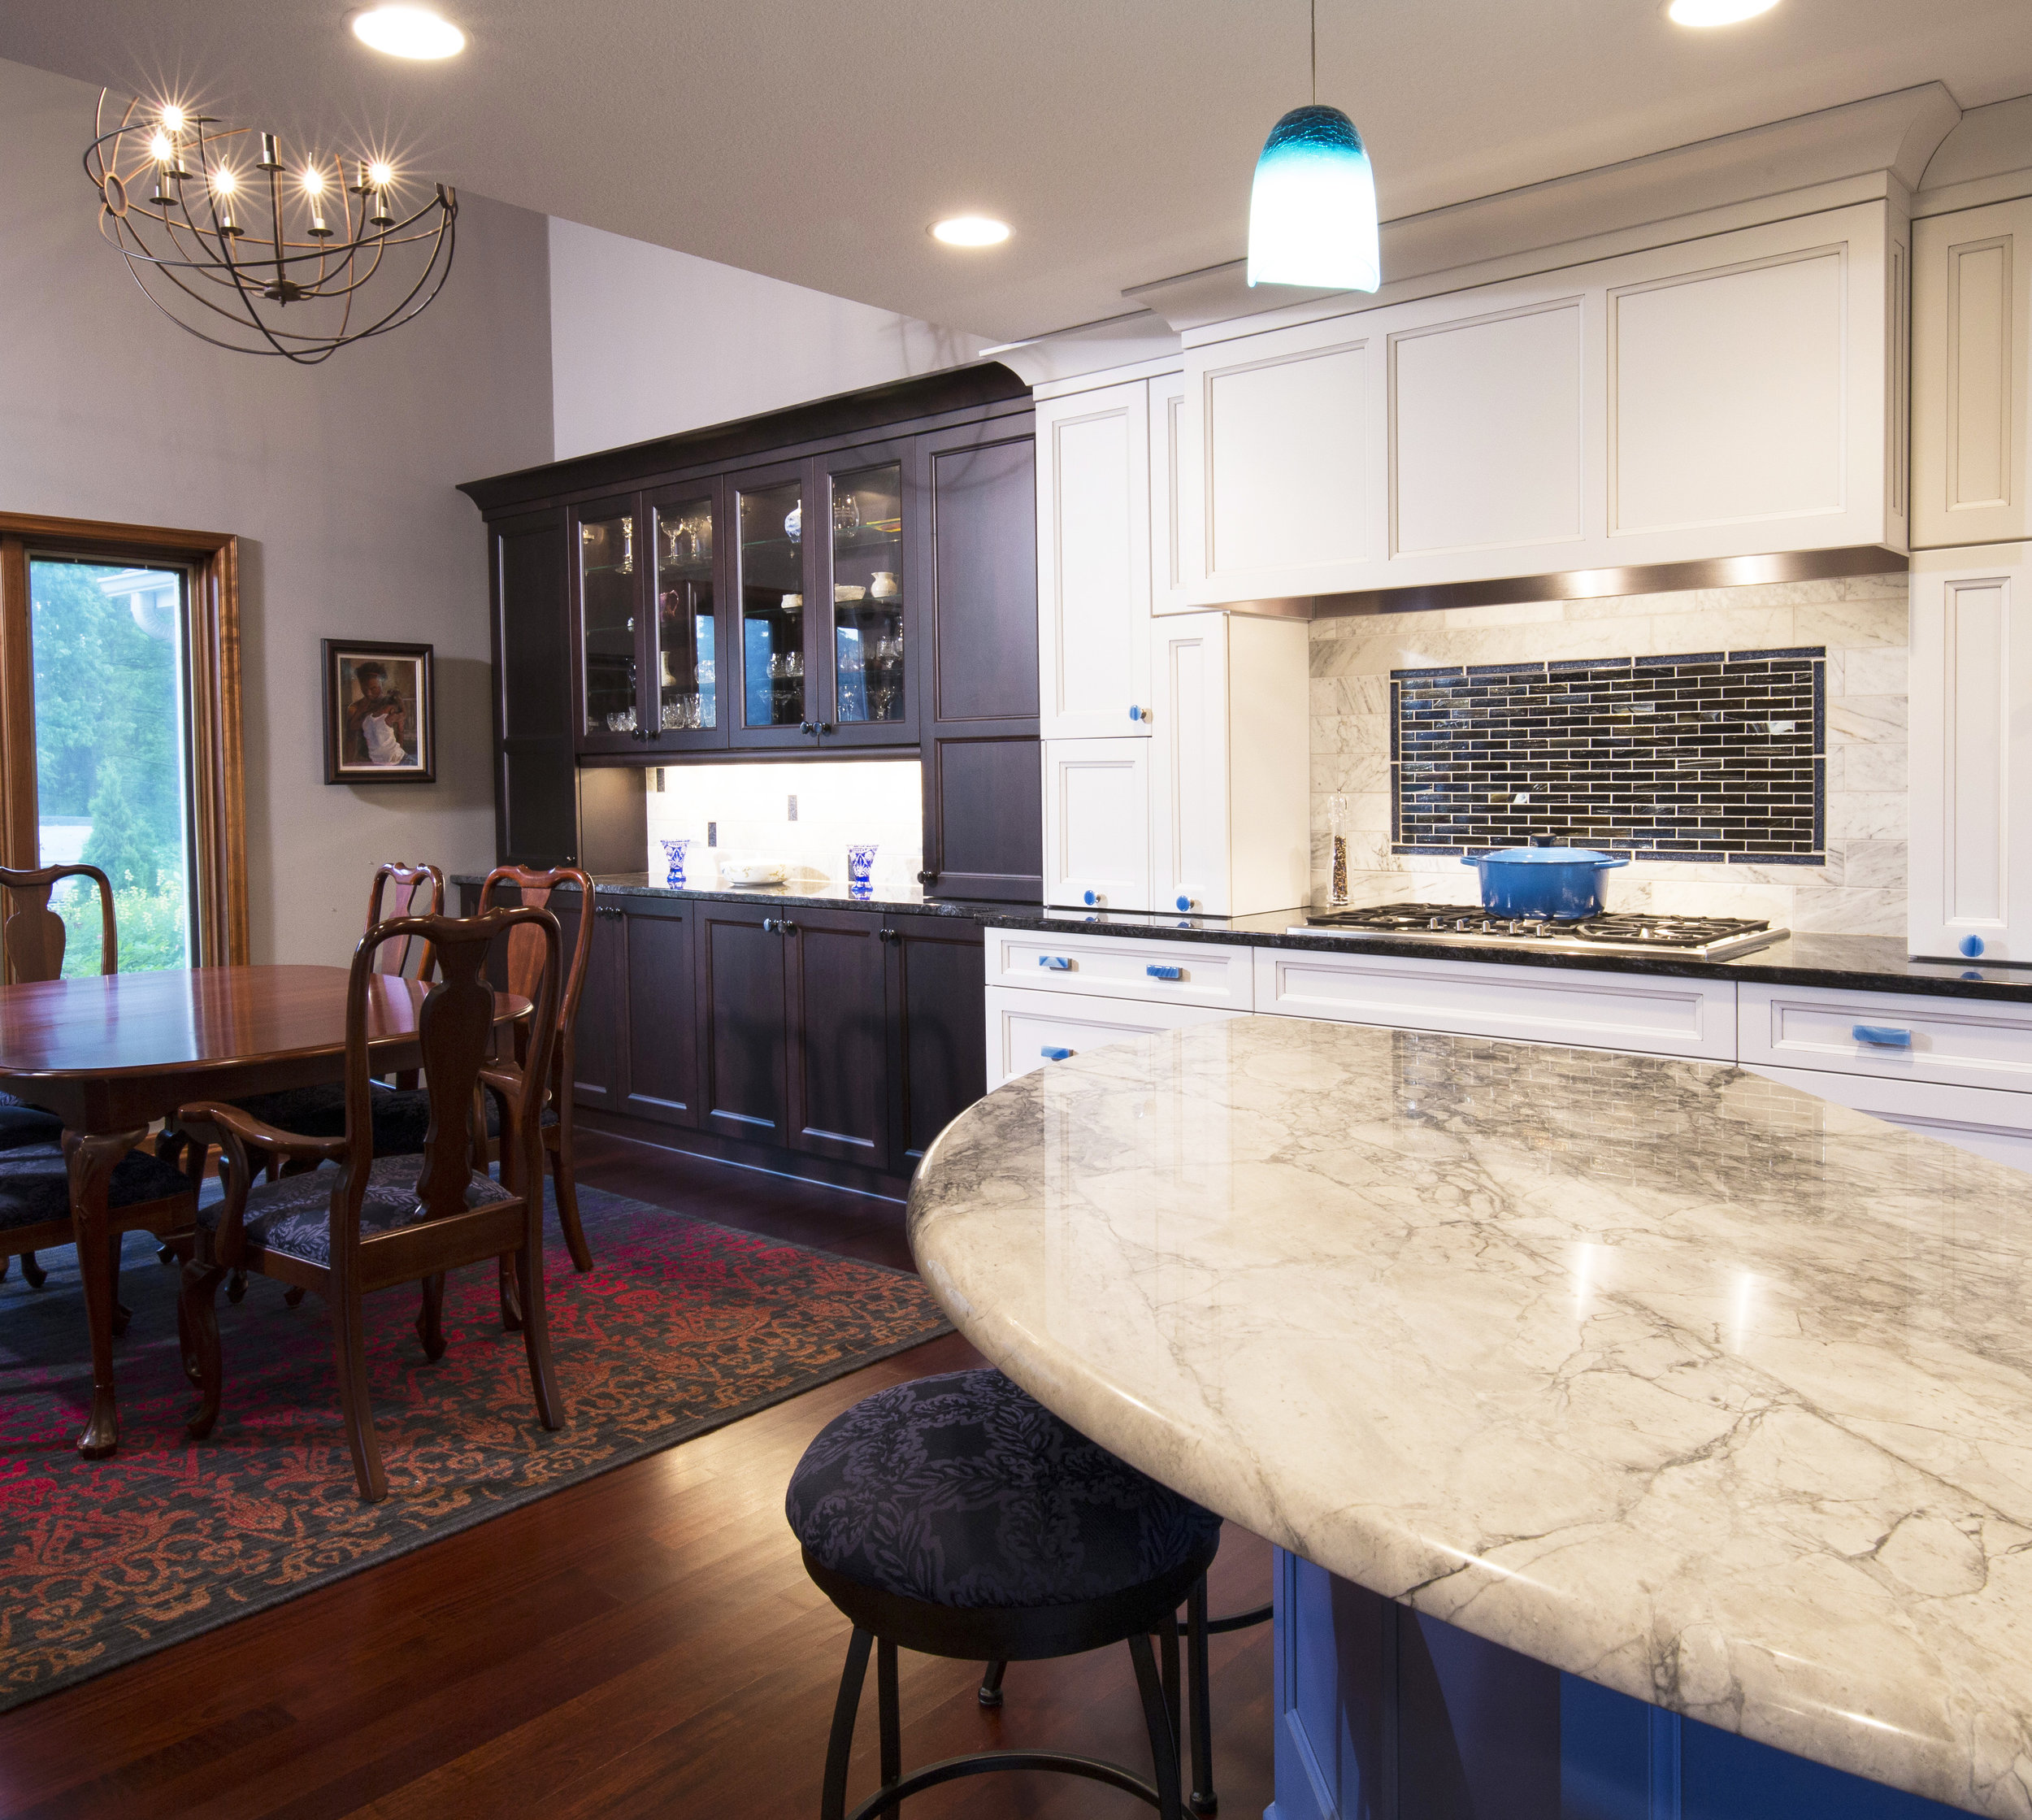 Orono Home-Kitchen PIC 2 08 (1).jpg